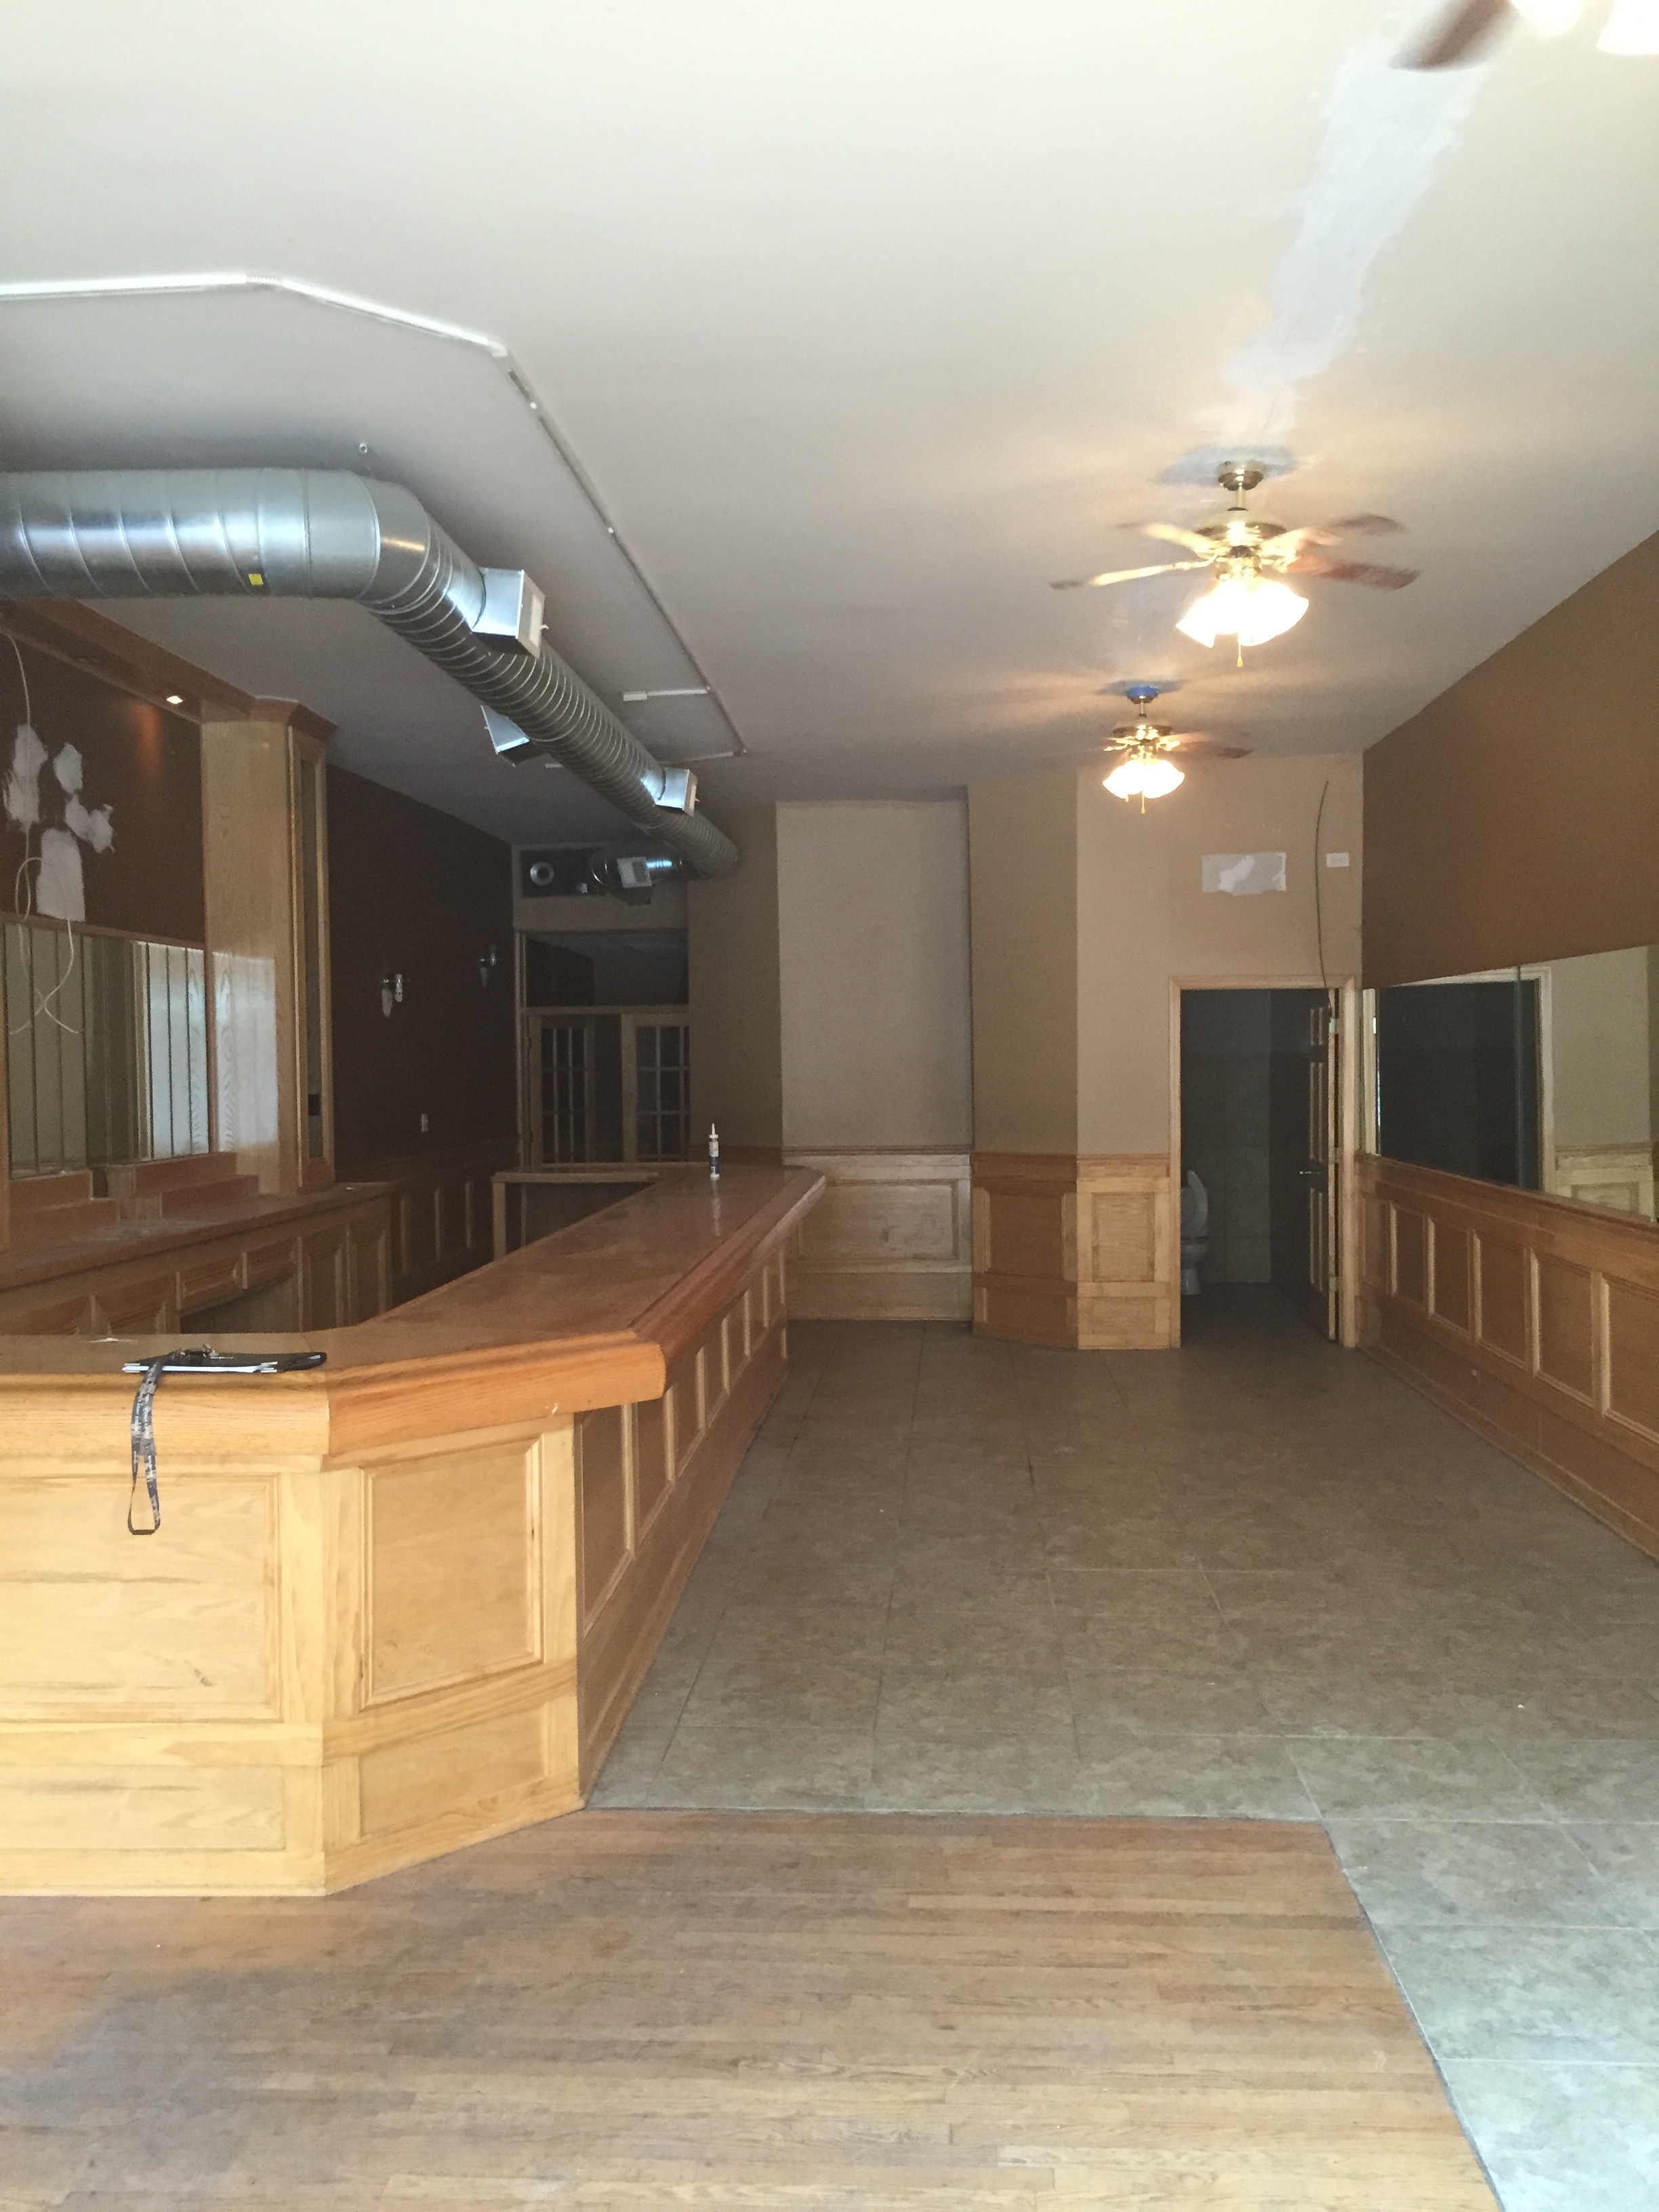 3 000 sf bar restaurant for rent on division in west town. Black Bedroom Furniture Sets. Home Design Ideas